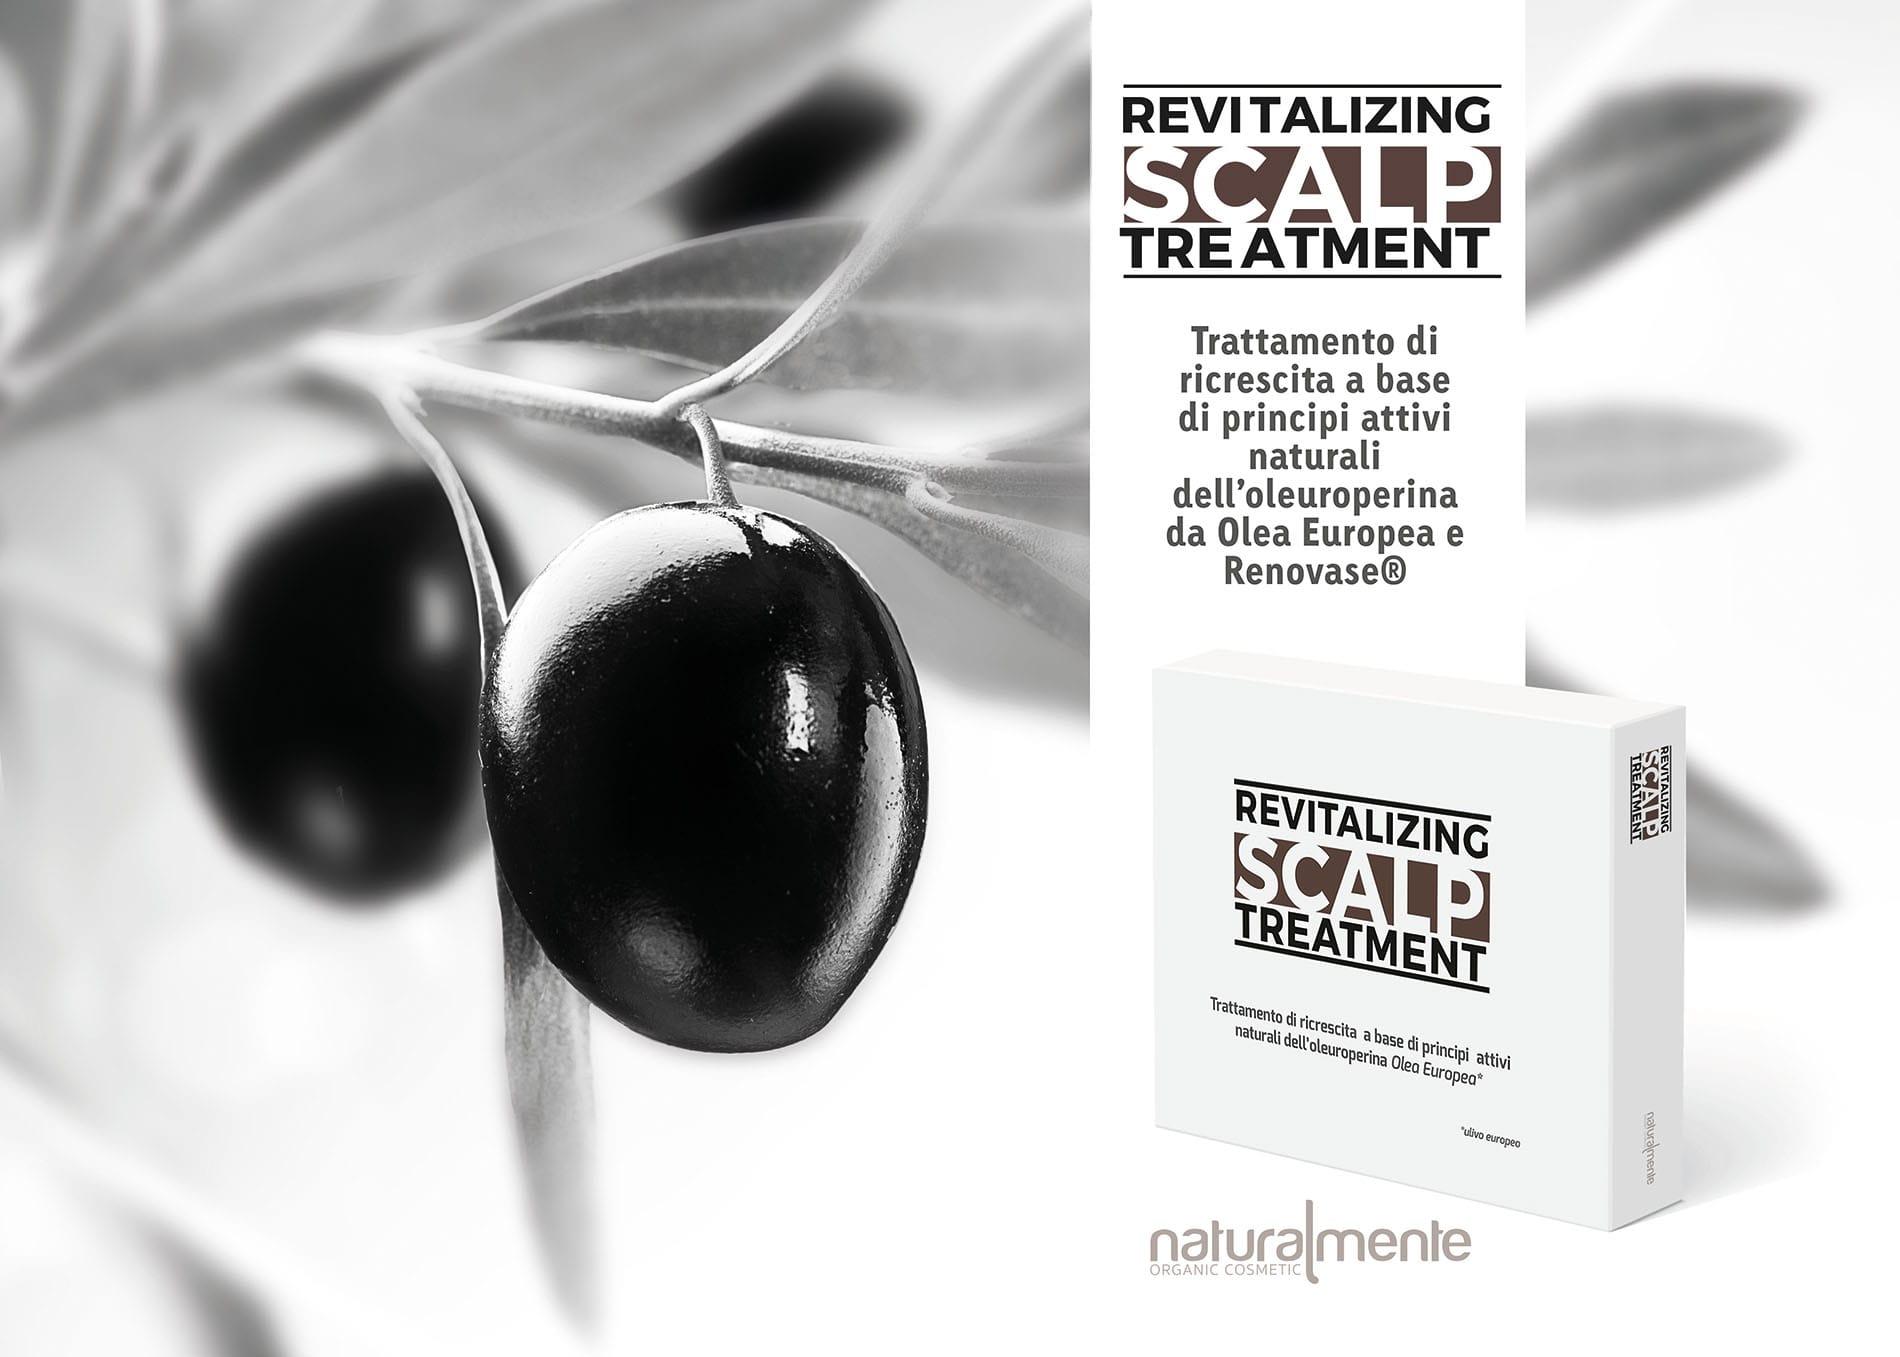 Revitalizing Scalp Treatment